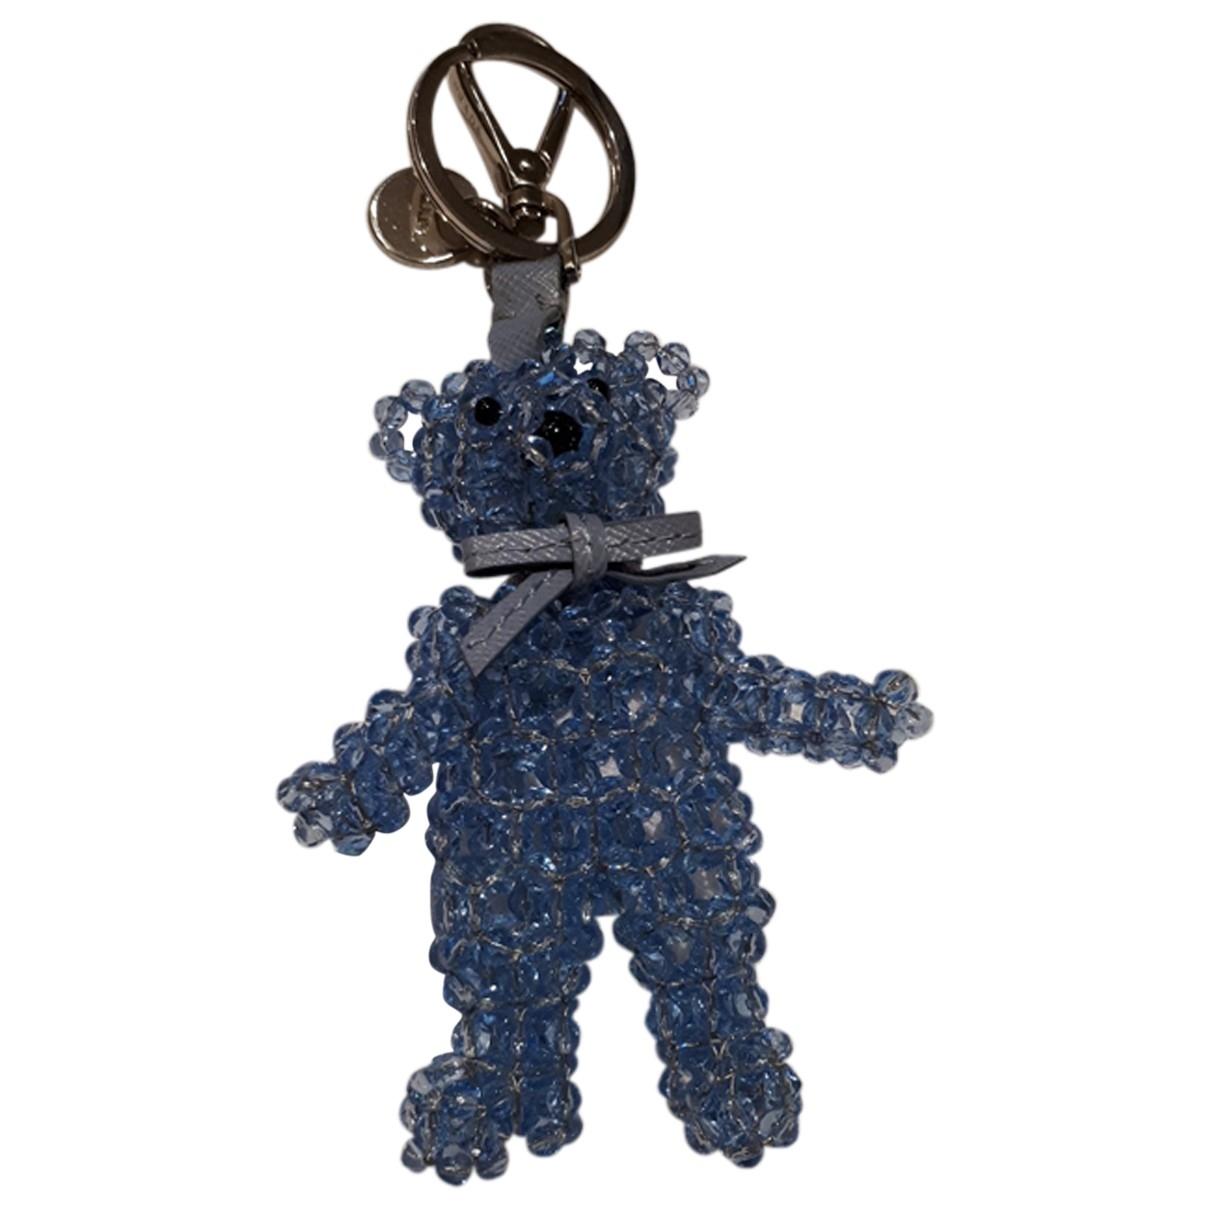 Prada - Bijoux de sac   pour femme en metal - bleu